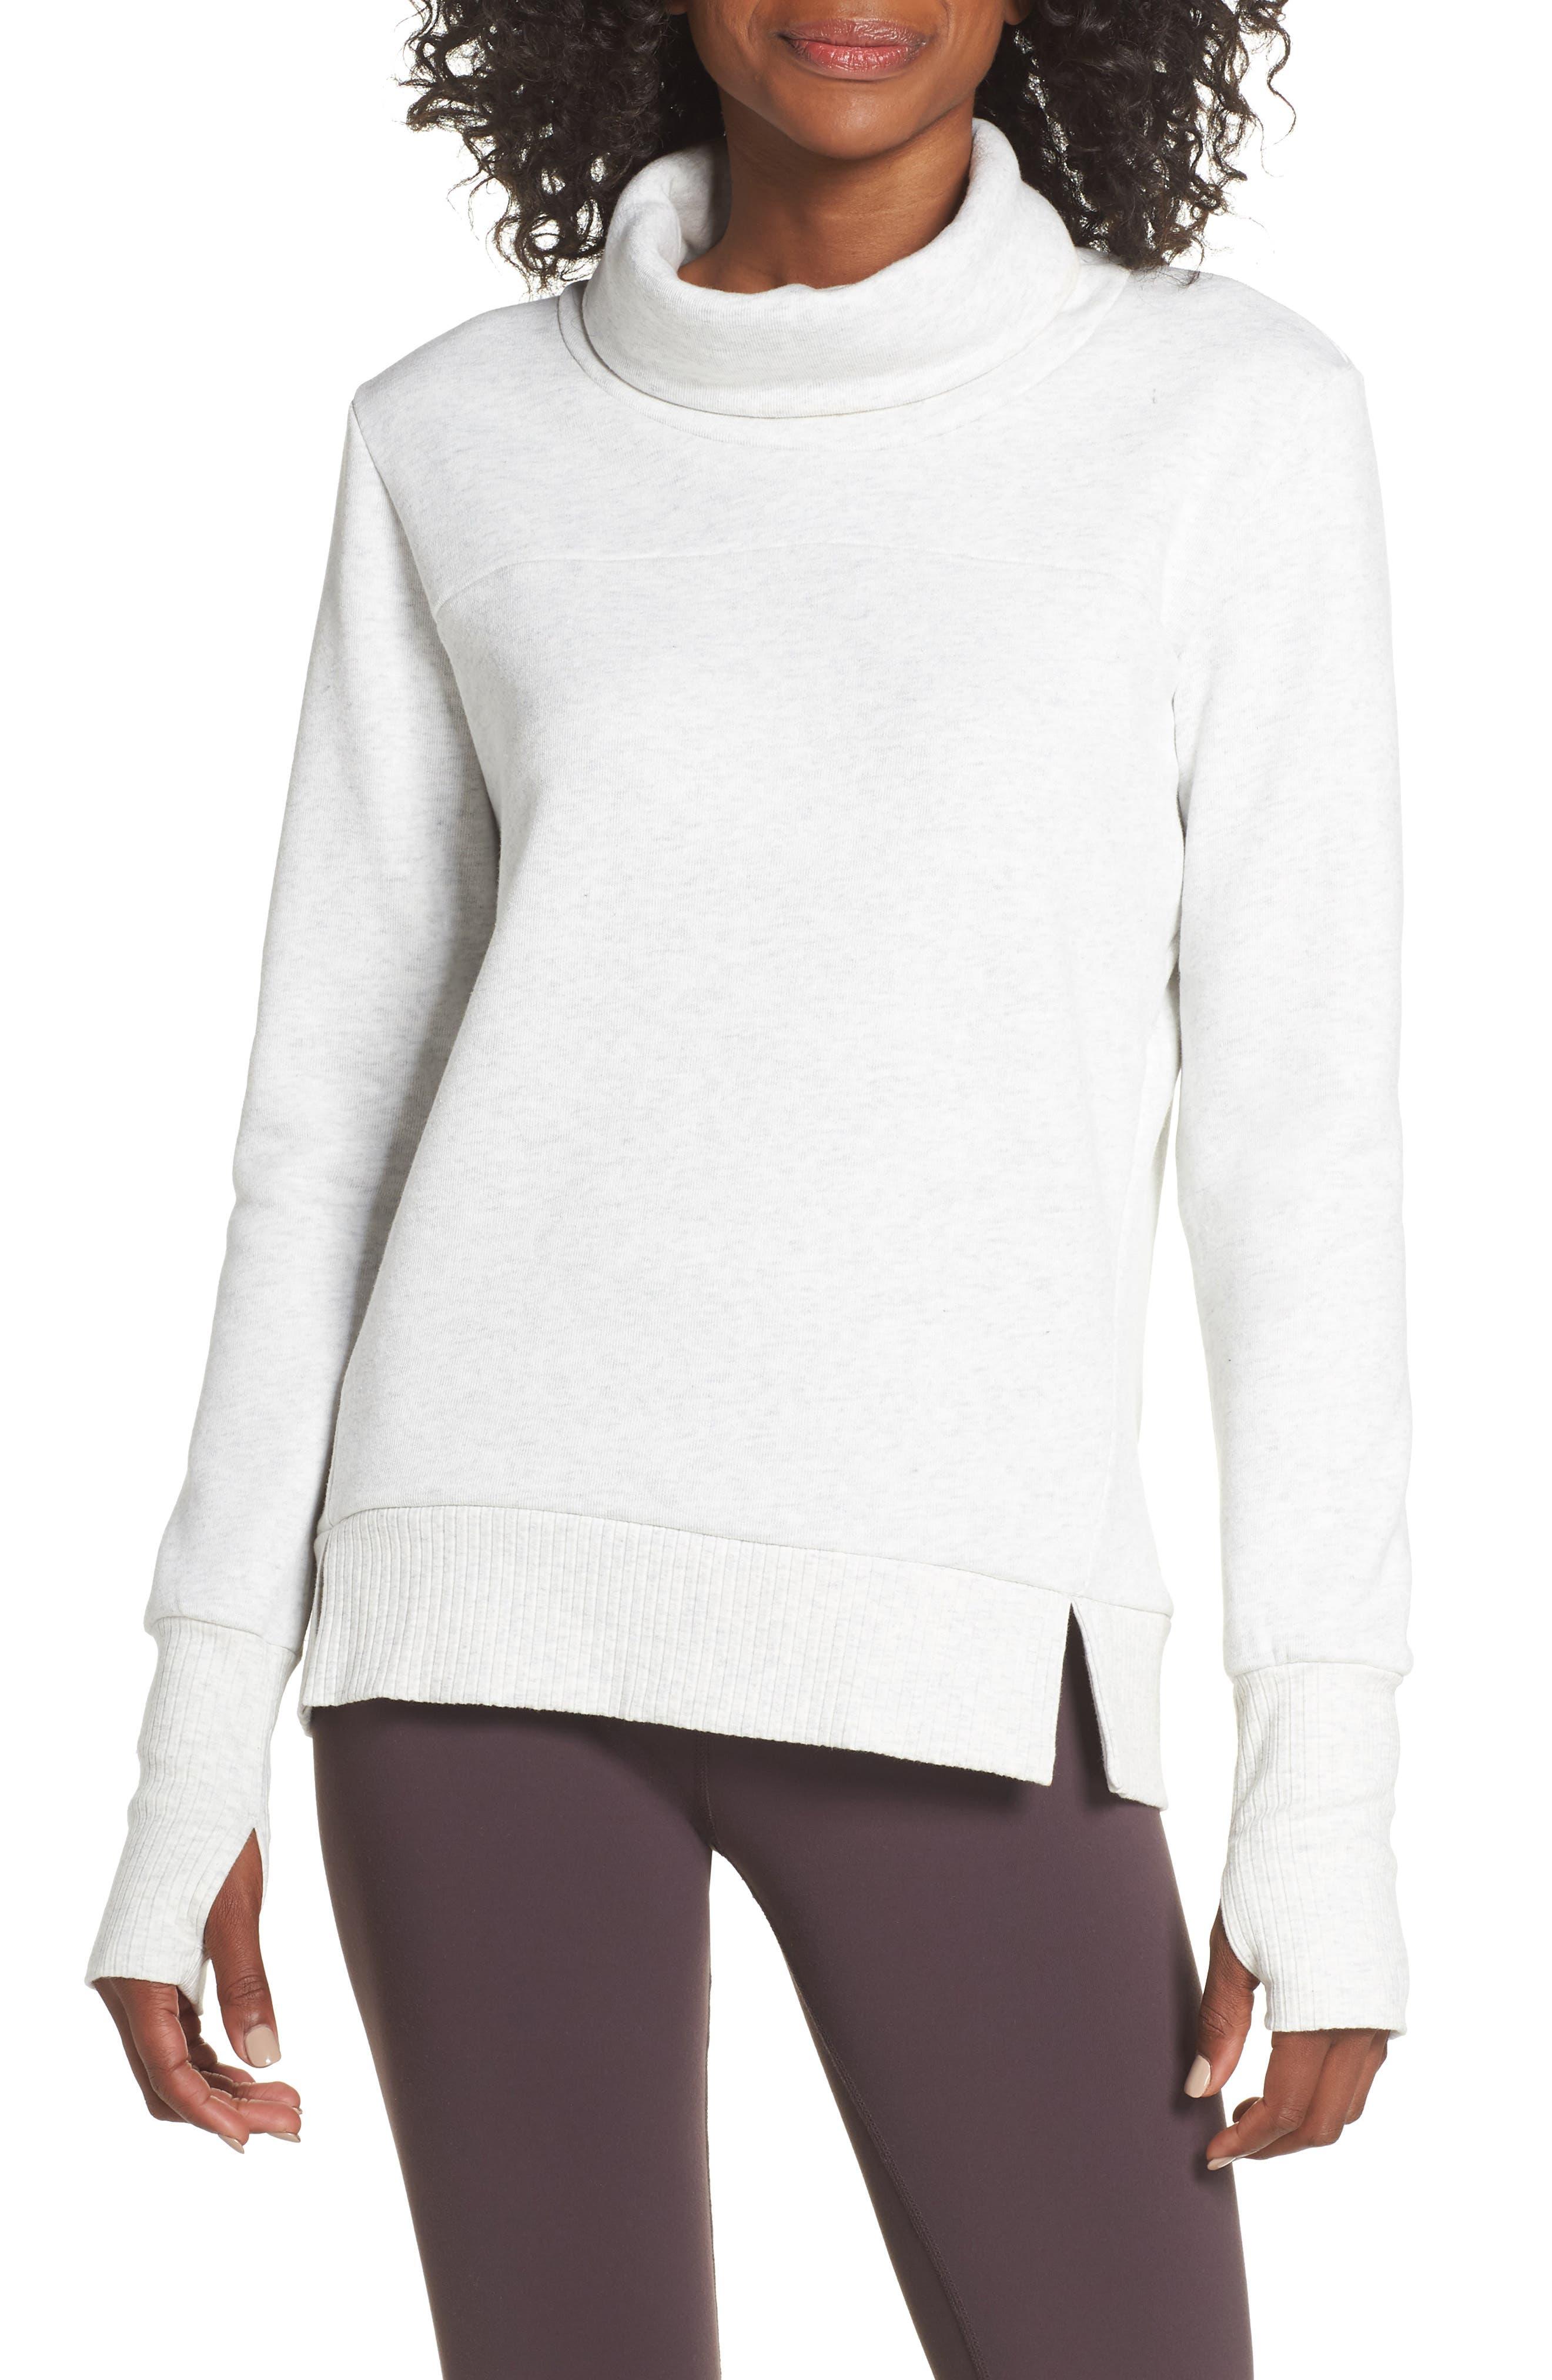 'Haze' Funnel Neck Sweatshirt,                         Main,                         color, WHITE HEATHER